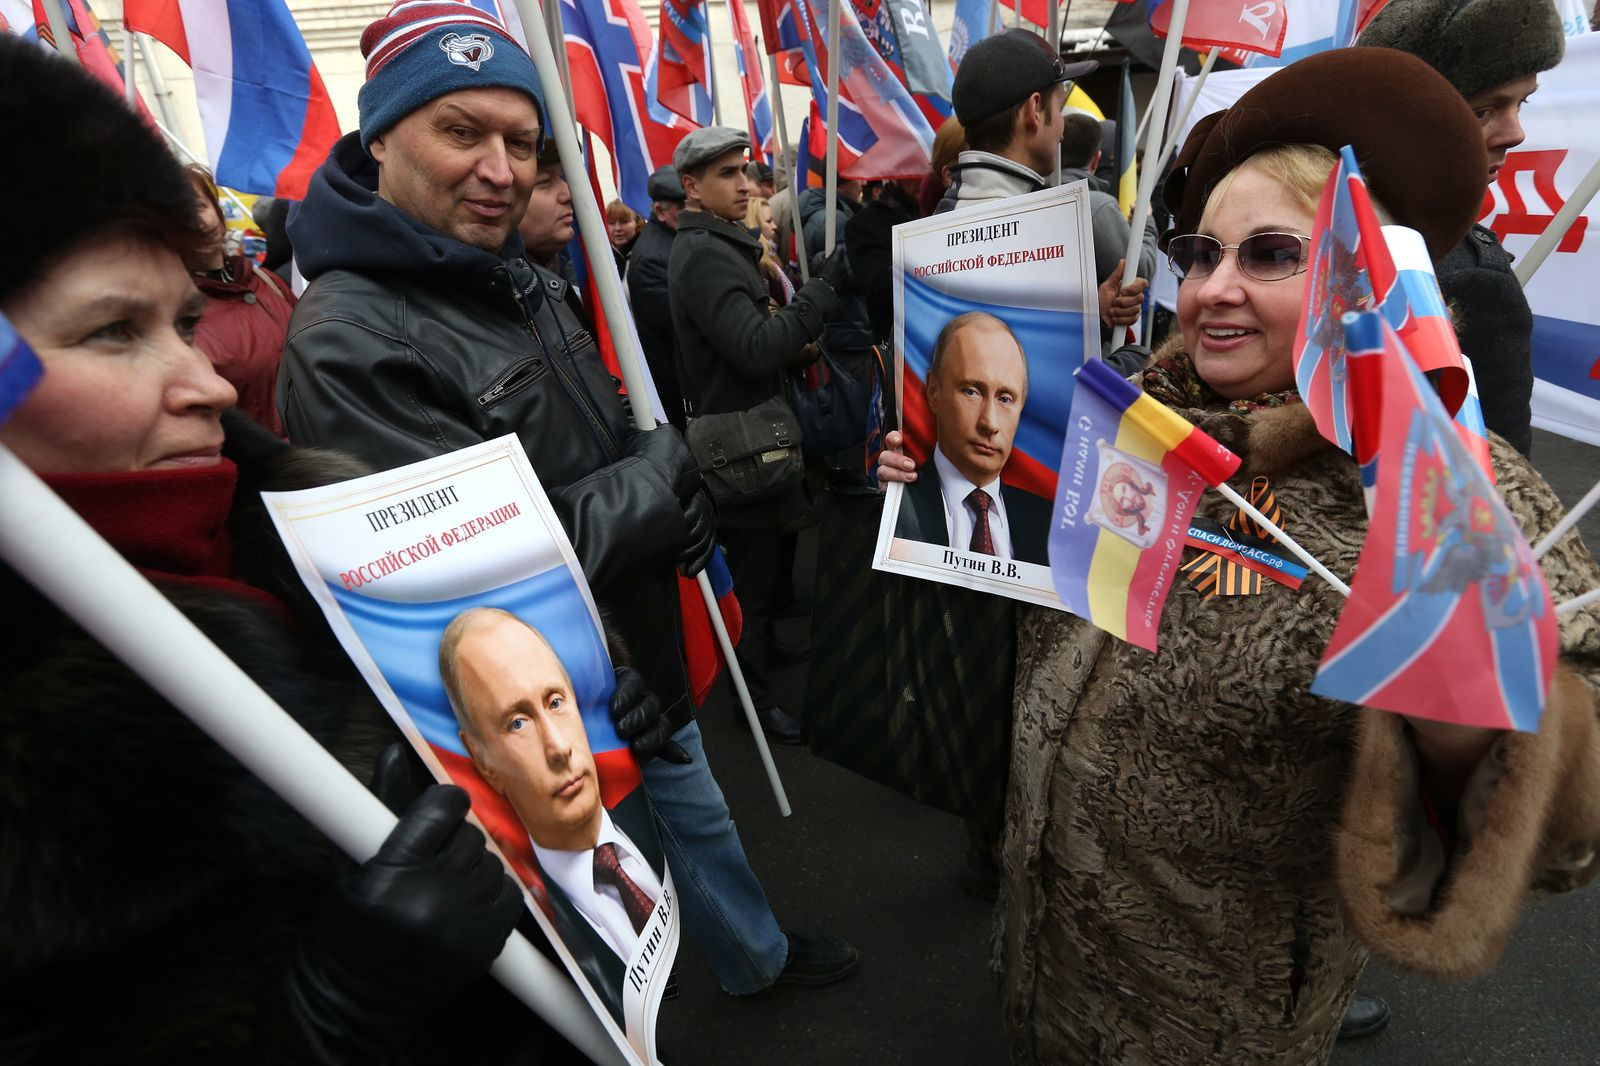 Russian Anti-Maidan Movement Rally On One Year Anniversary Of The Maidan Revolution